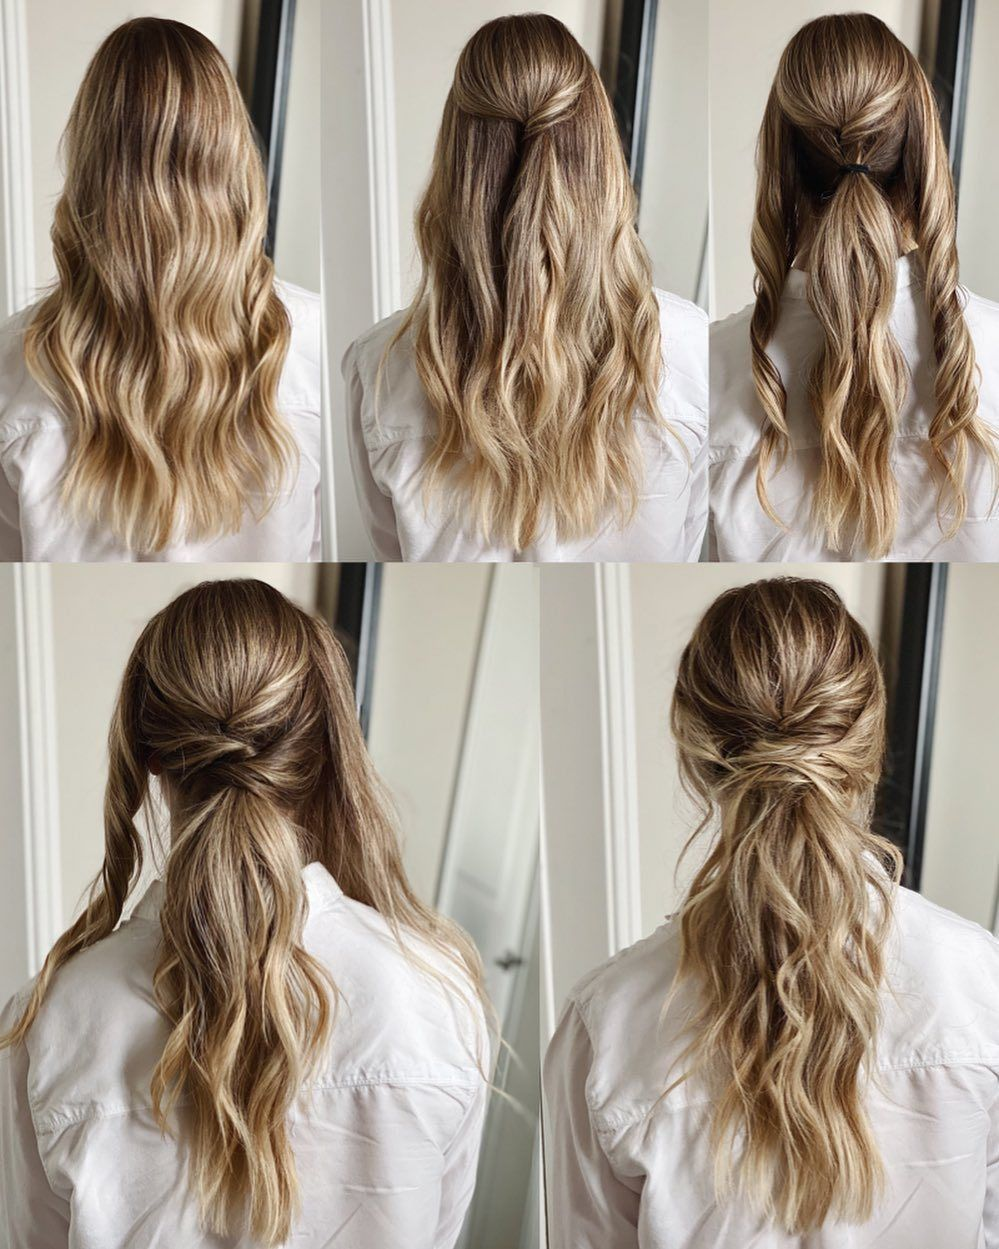 Wavy Low Ponytail Ponytail Hairstyles Tutorial Nurse Hairstyles Bridal Ponytail Hairstyles